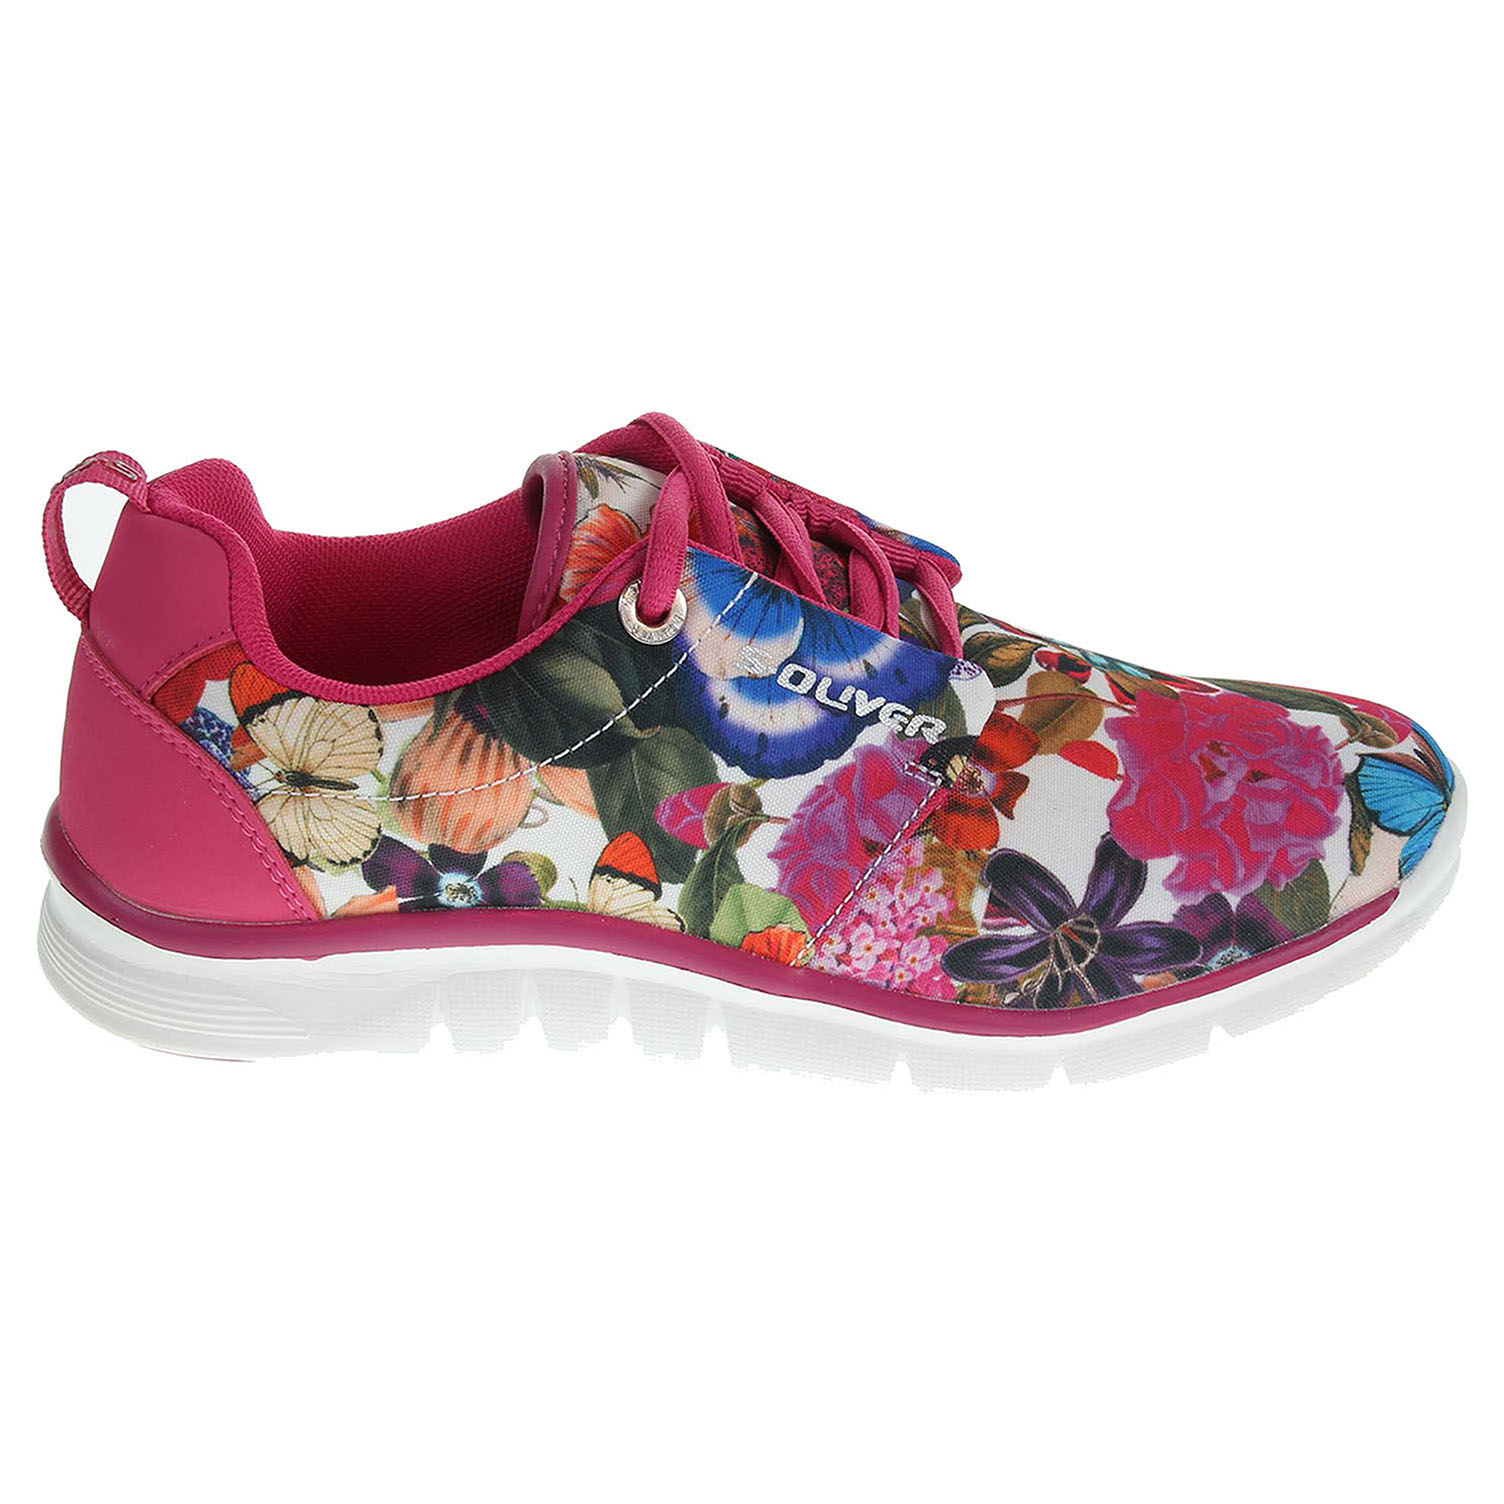 s.Oliver dámská obuv 5-23616-34 růžová 40 multicolour multicolour